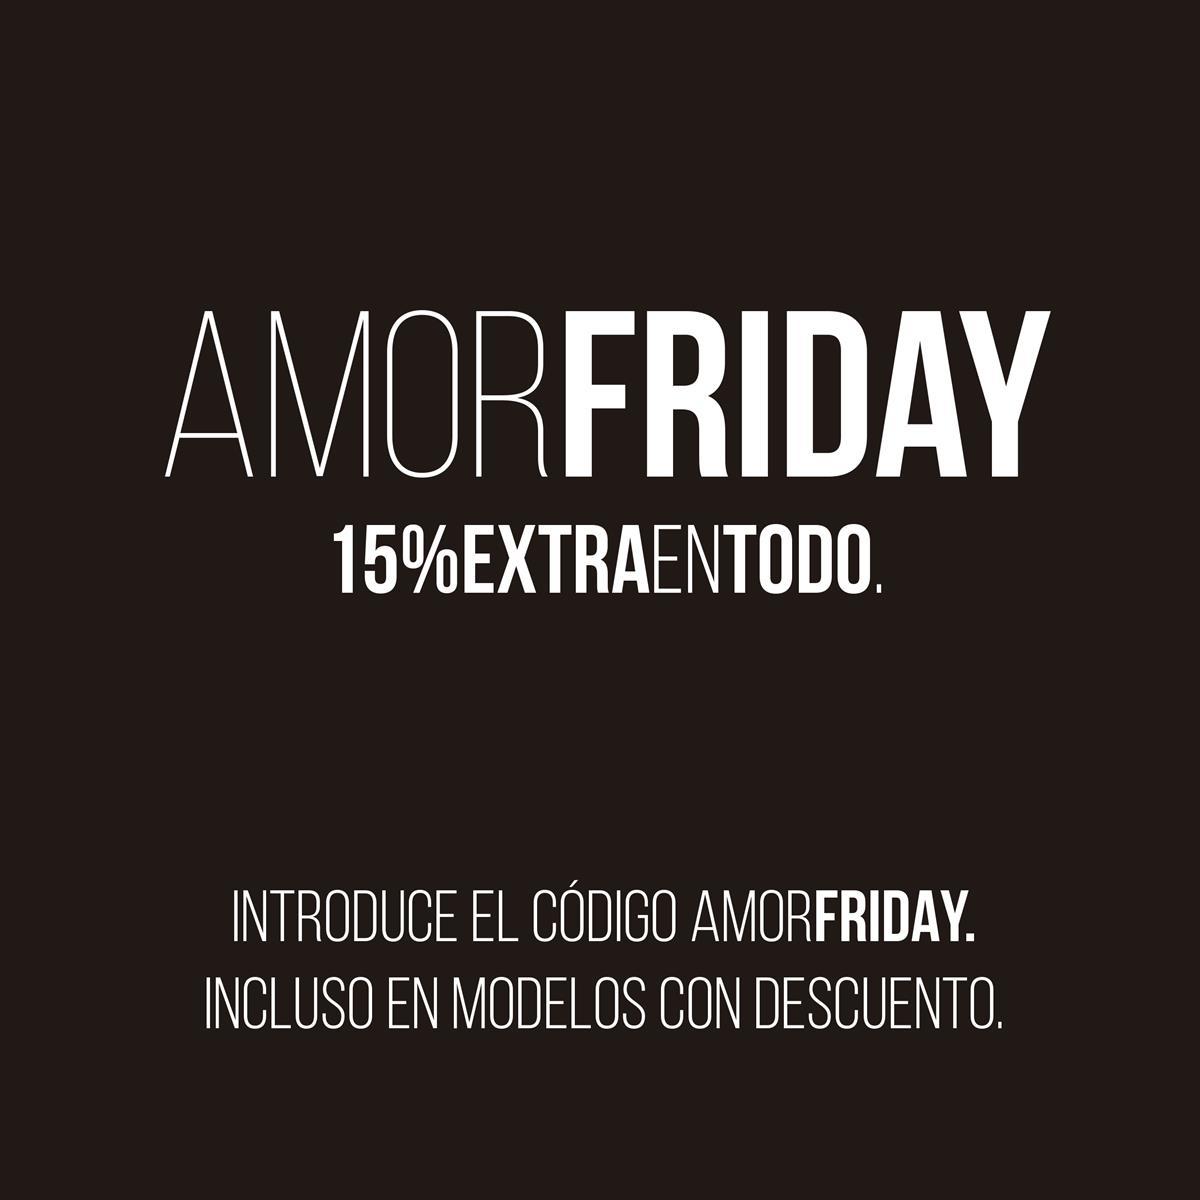 amorshoes-amorfriday-blackfriday-cibermonday-2018